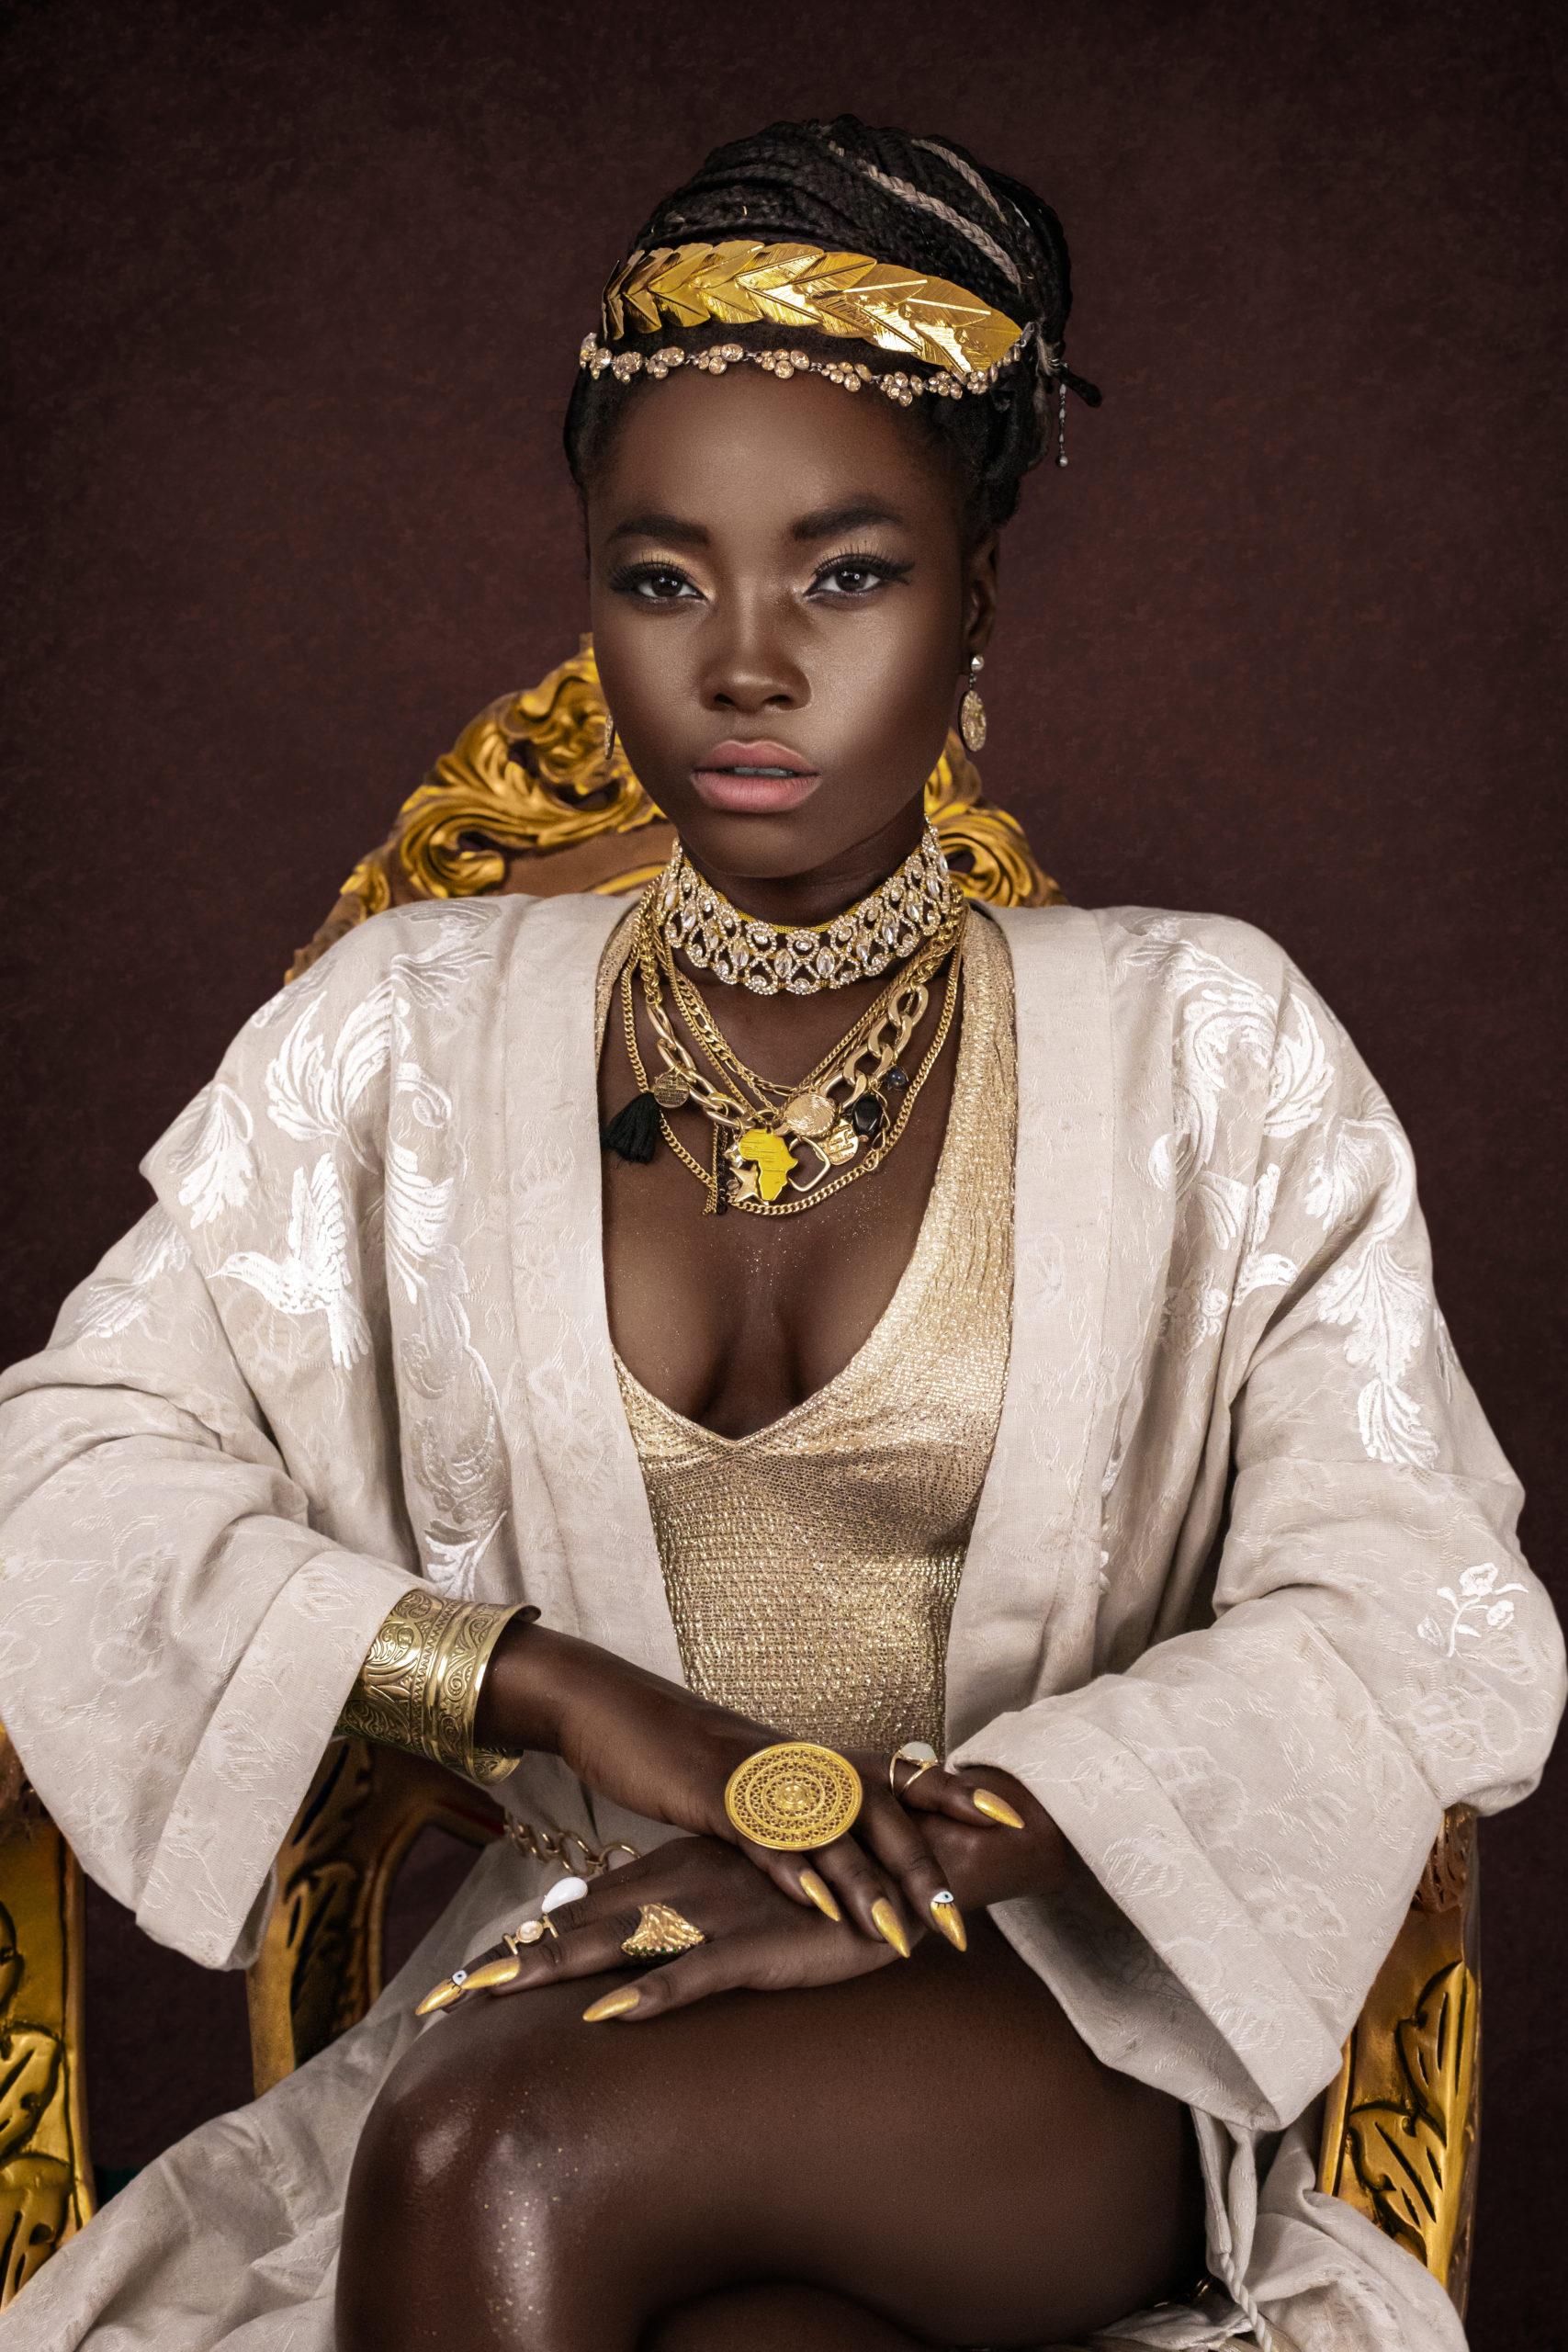 Female Egyptian Pharaoh Ruling From Gold Throne